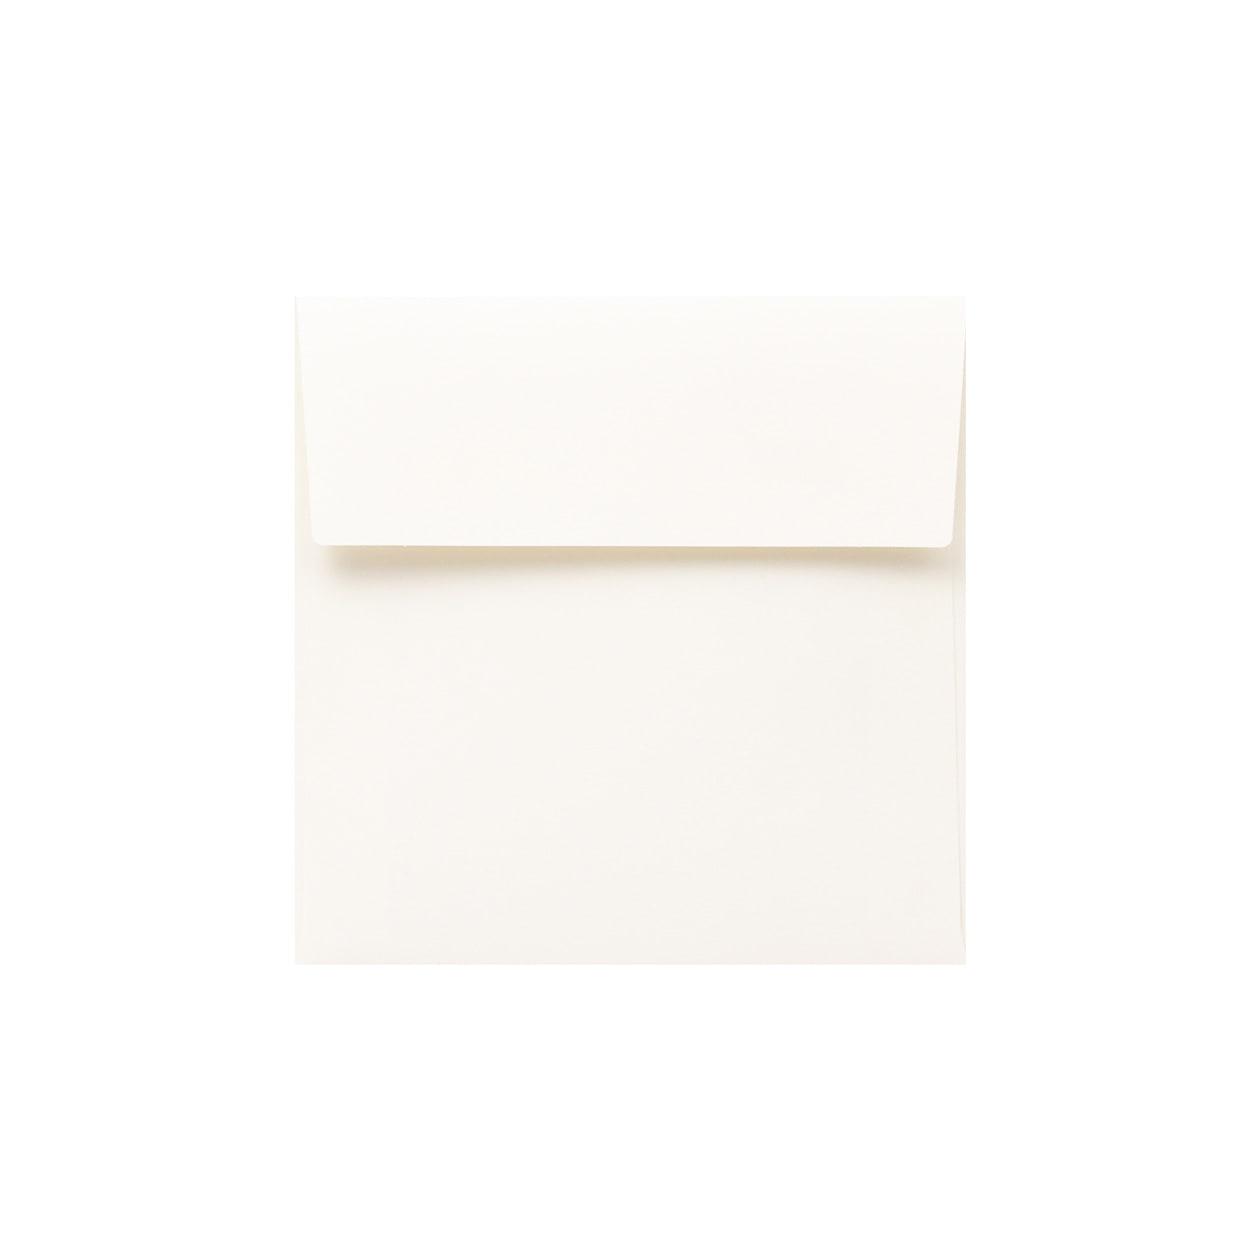 SE12.5カマス封筒 HAGURUMA Basic ソフトクリーム 100g